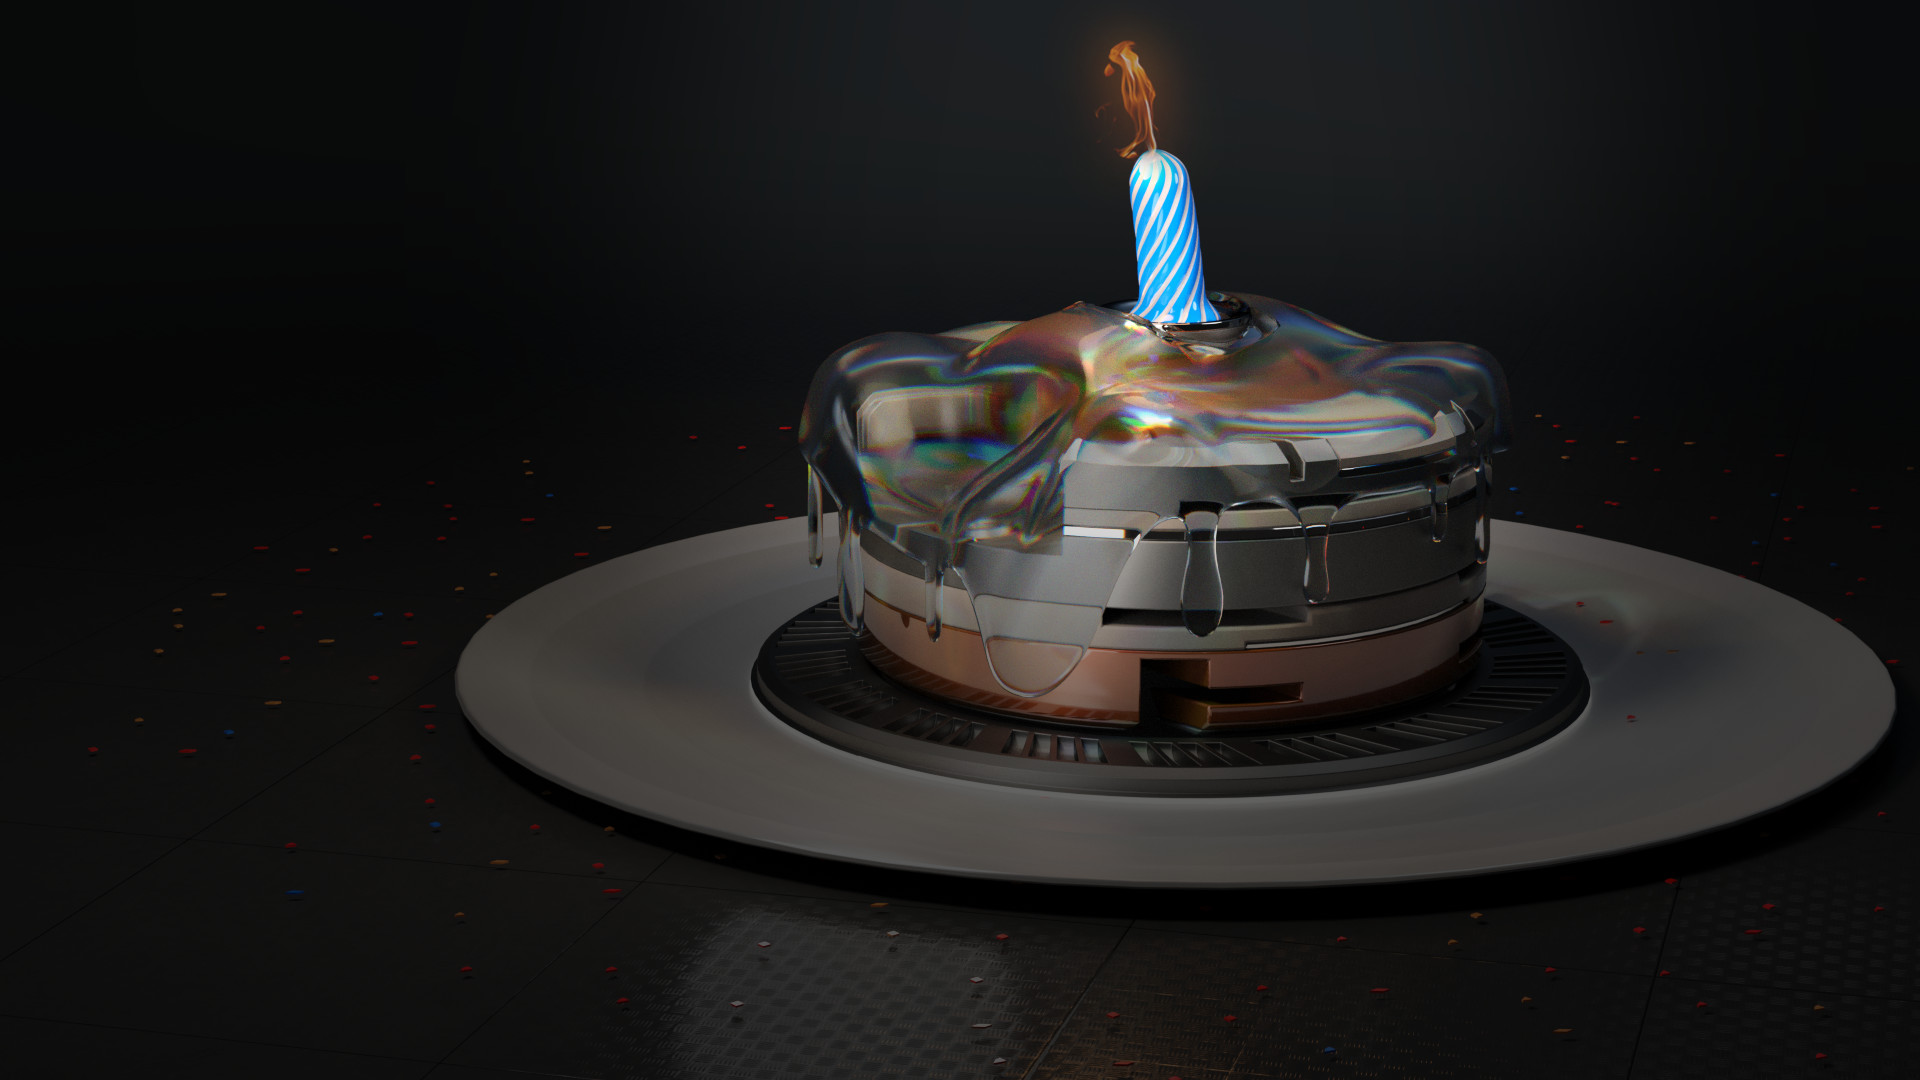 Jerry perkins mx1001 cake1